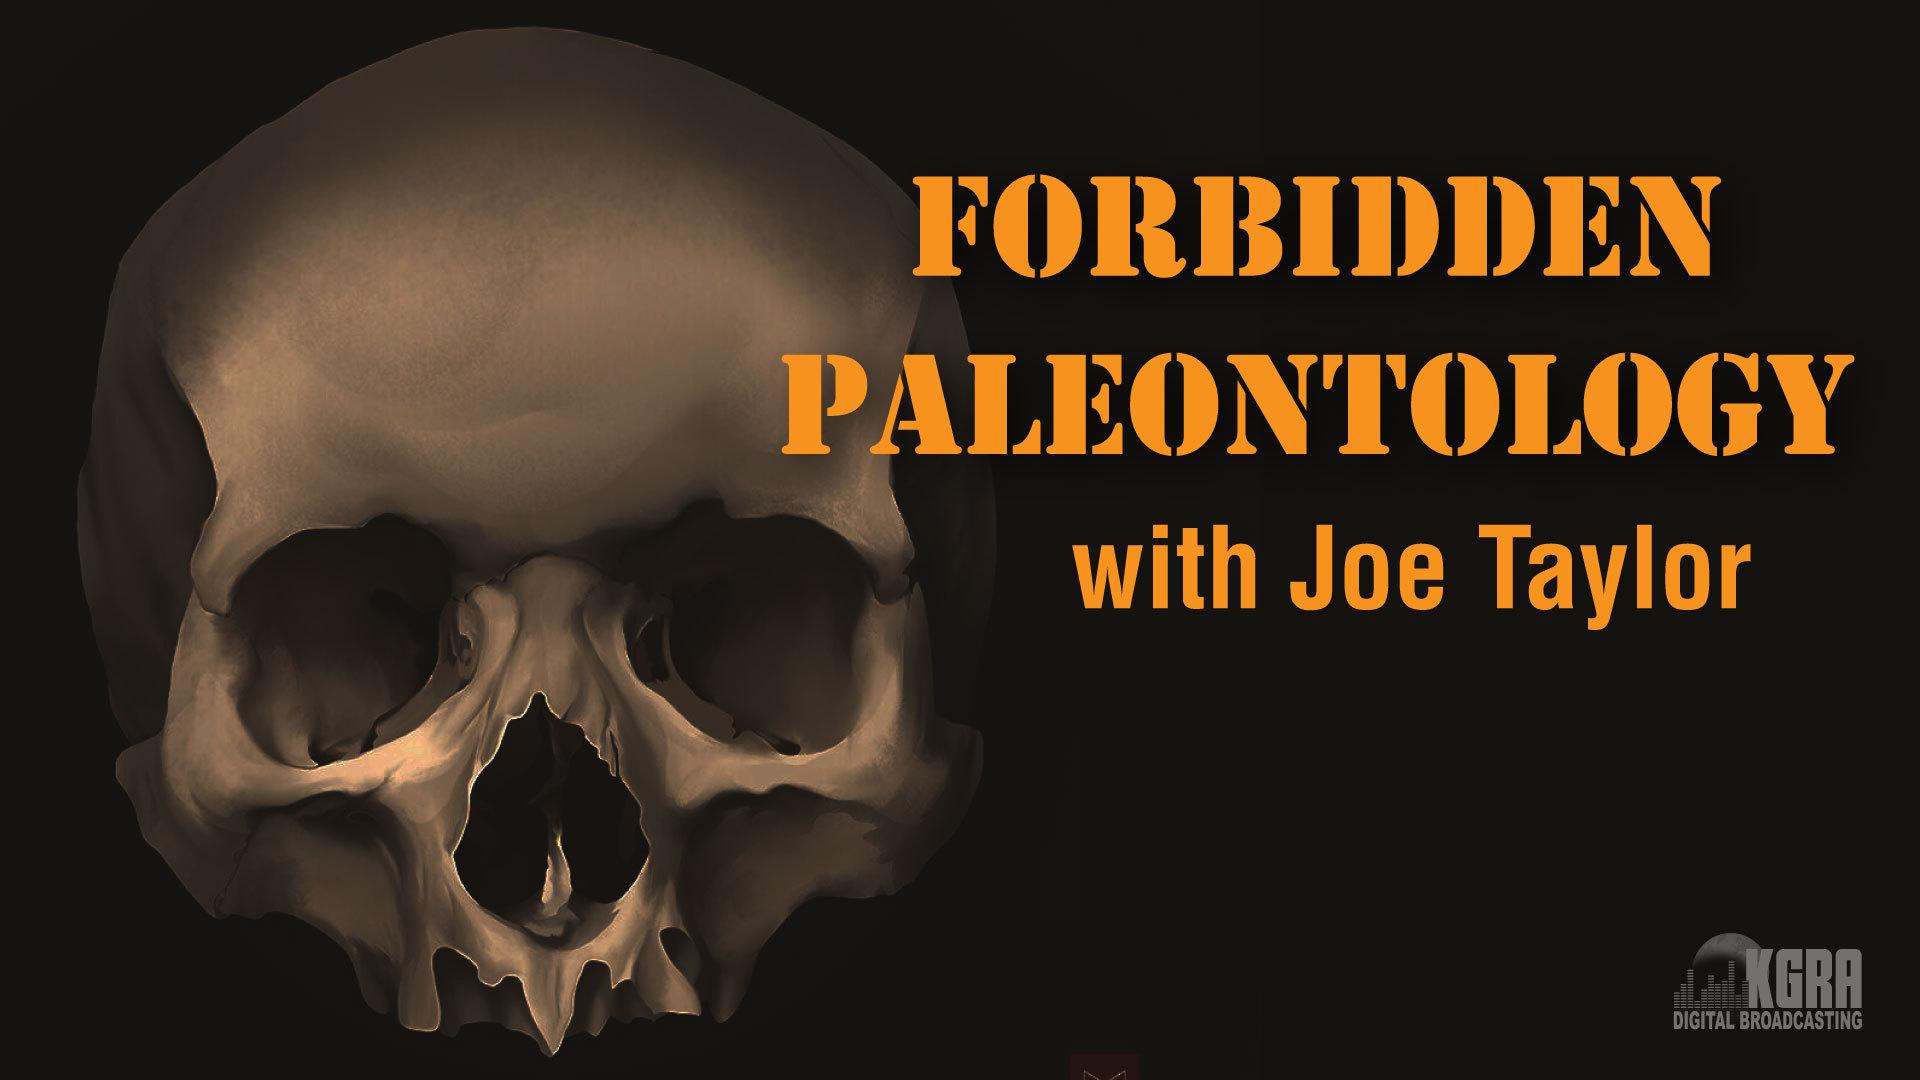 Forbidden Paleontology - Joe Taylor